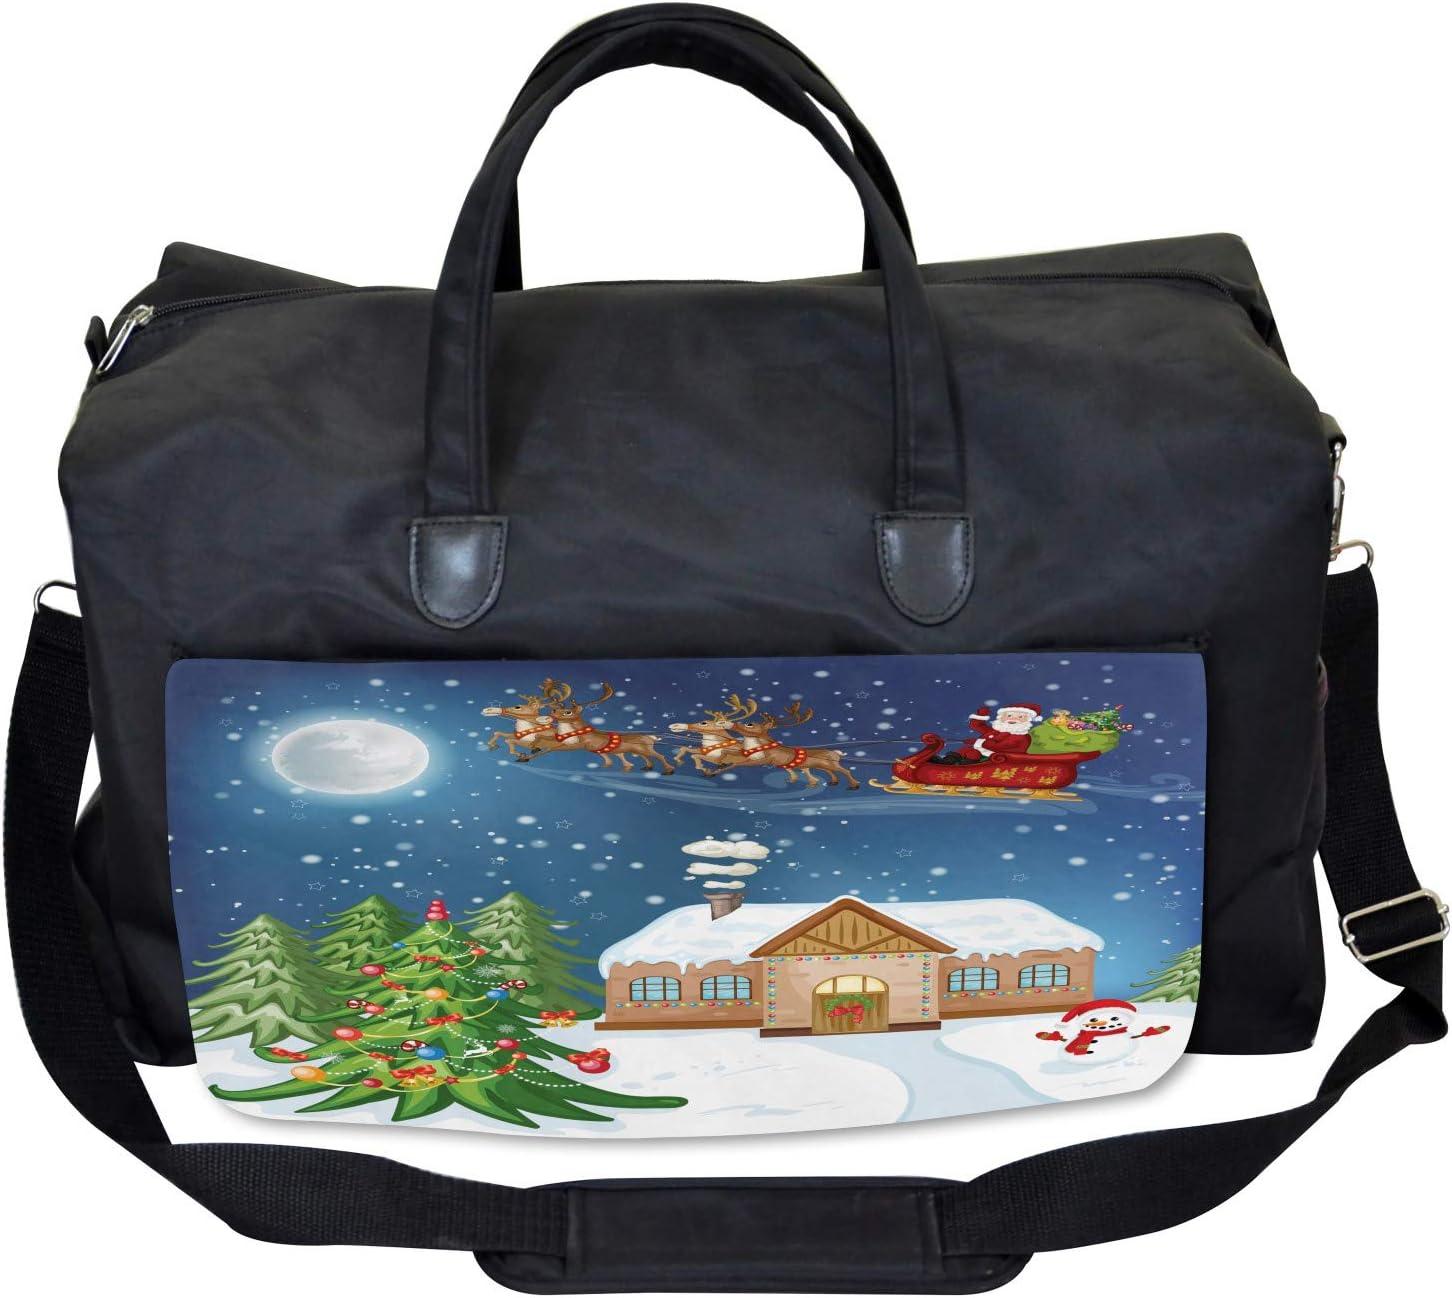 Ambesonne Christmas Gym Bag Large Weekender Carry-on Santa with Rudolf